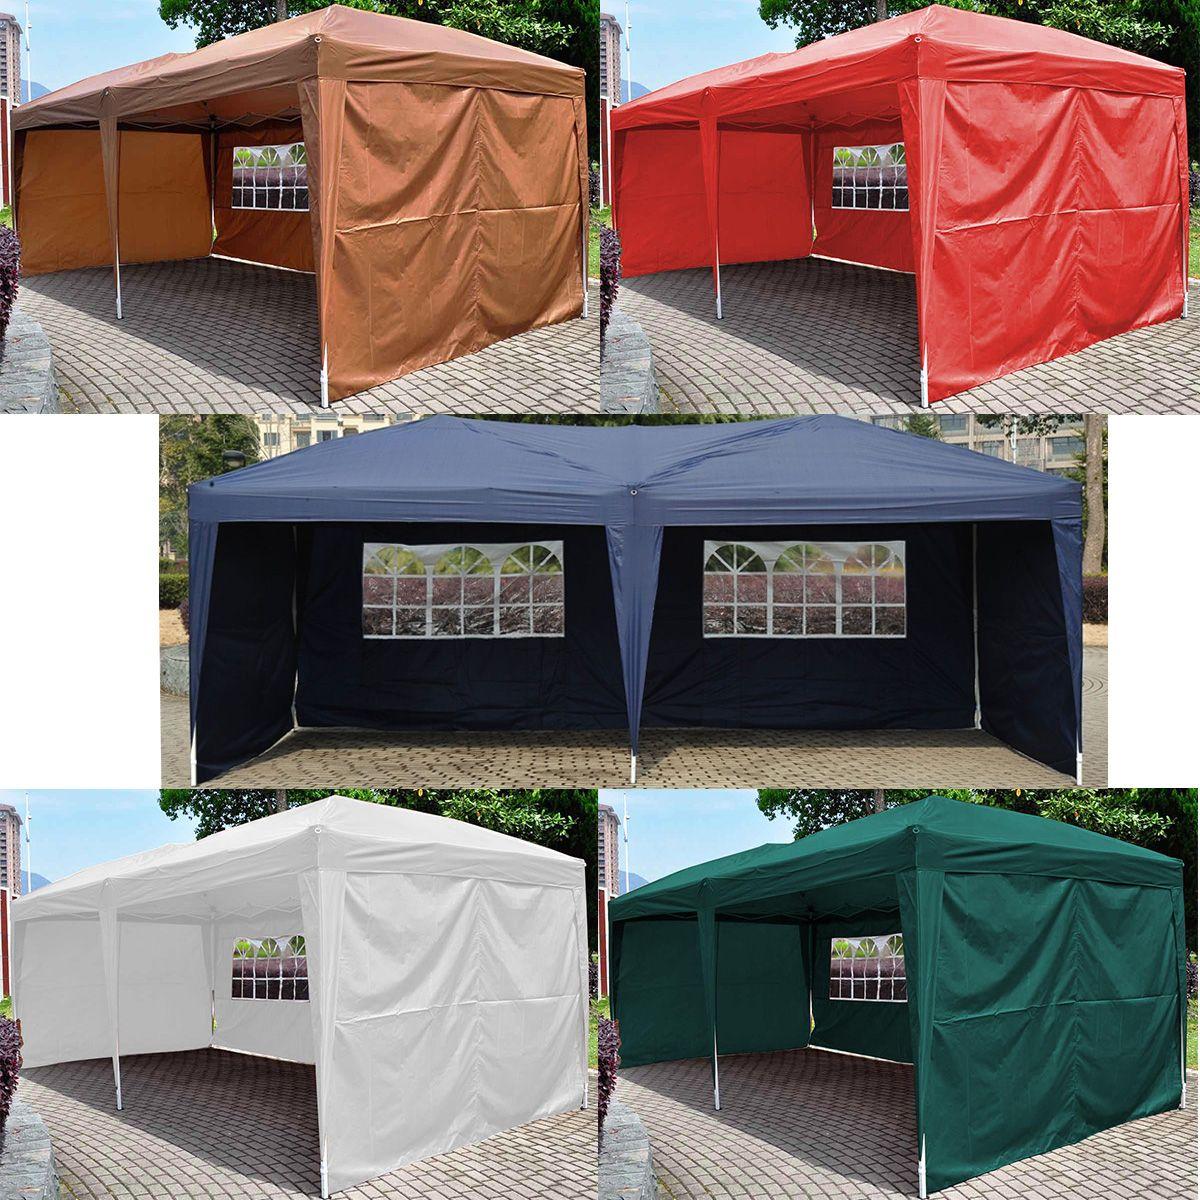 EZ POP UP Wedding Party Tent 10u0027X20u0027 Folding Gazebo Beach Canopy W/ & EZ POP UP Wedding Party Tent 10u0027X20u0027 Folding Gazebo Beach Canopy W ...